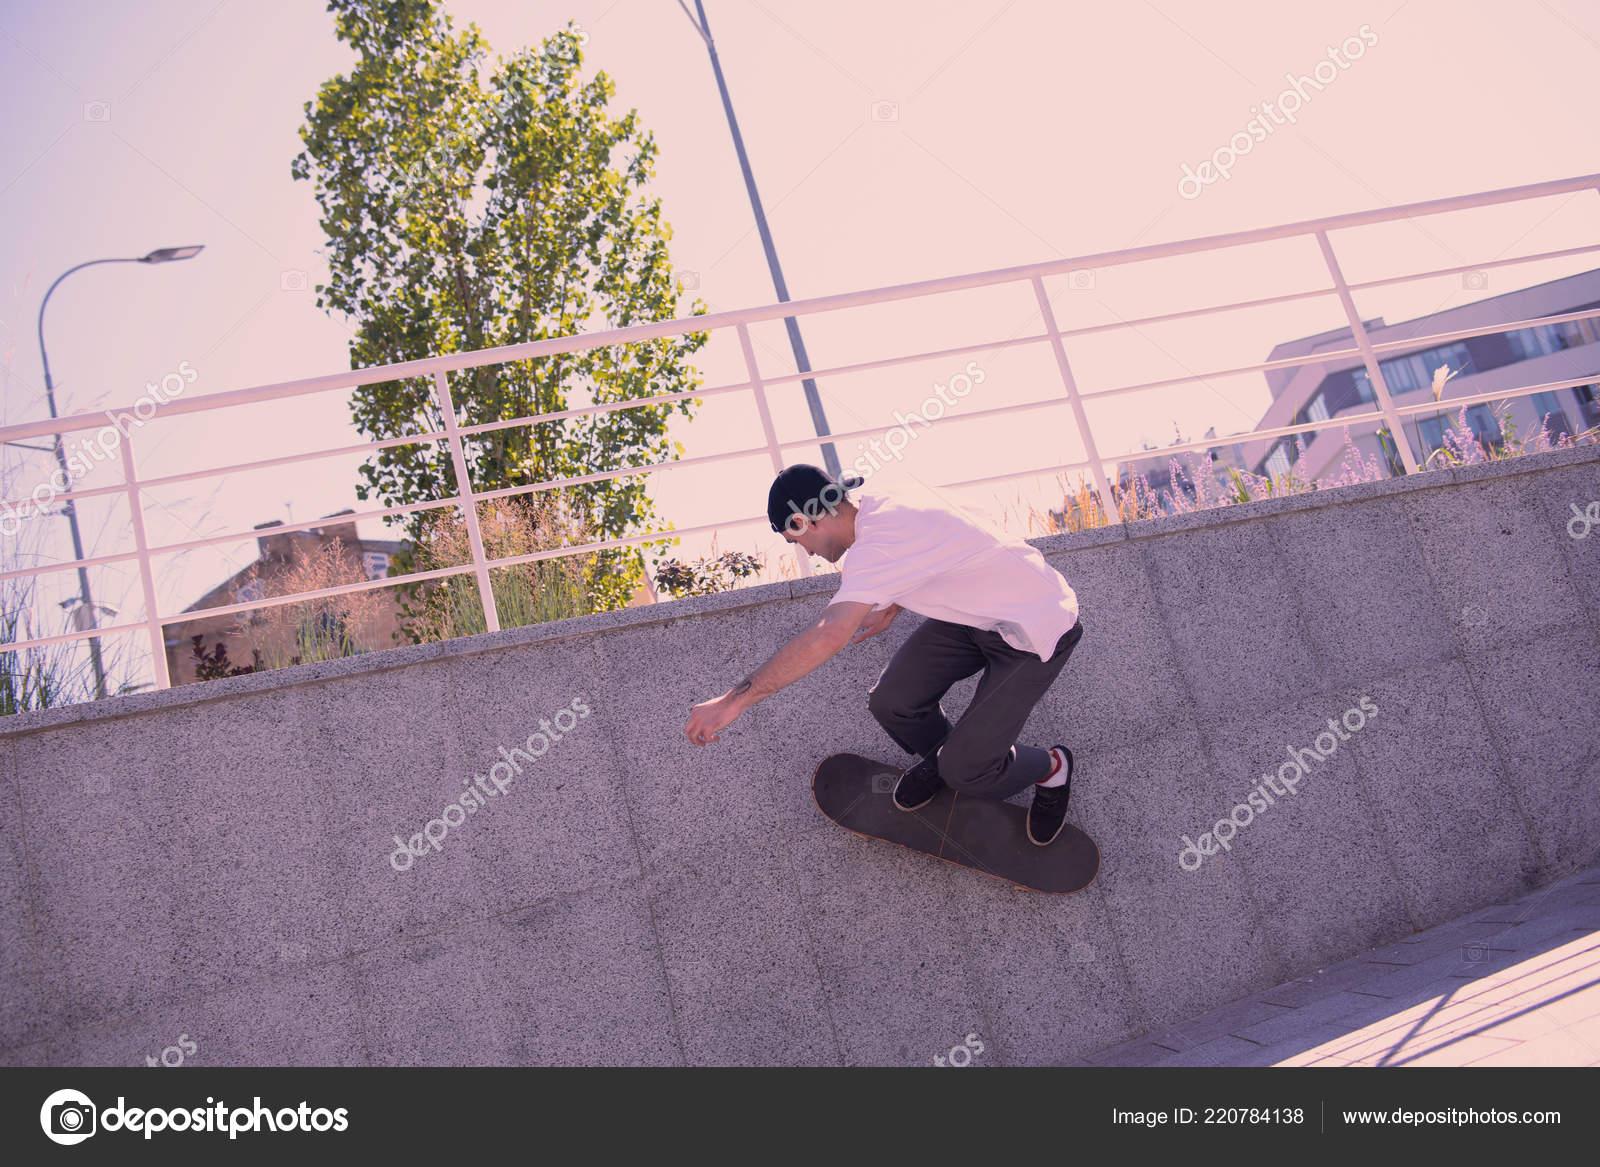 sesso Skateboard Tavole ed BN incontri